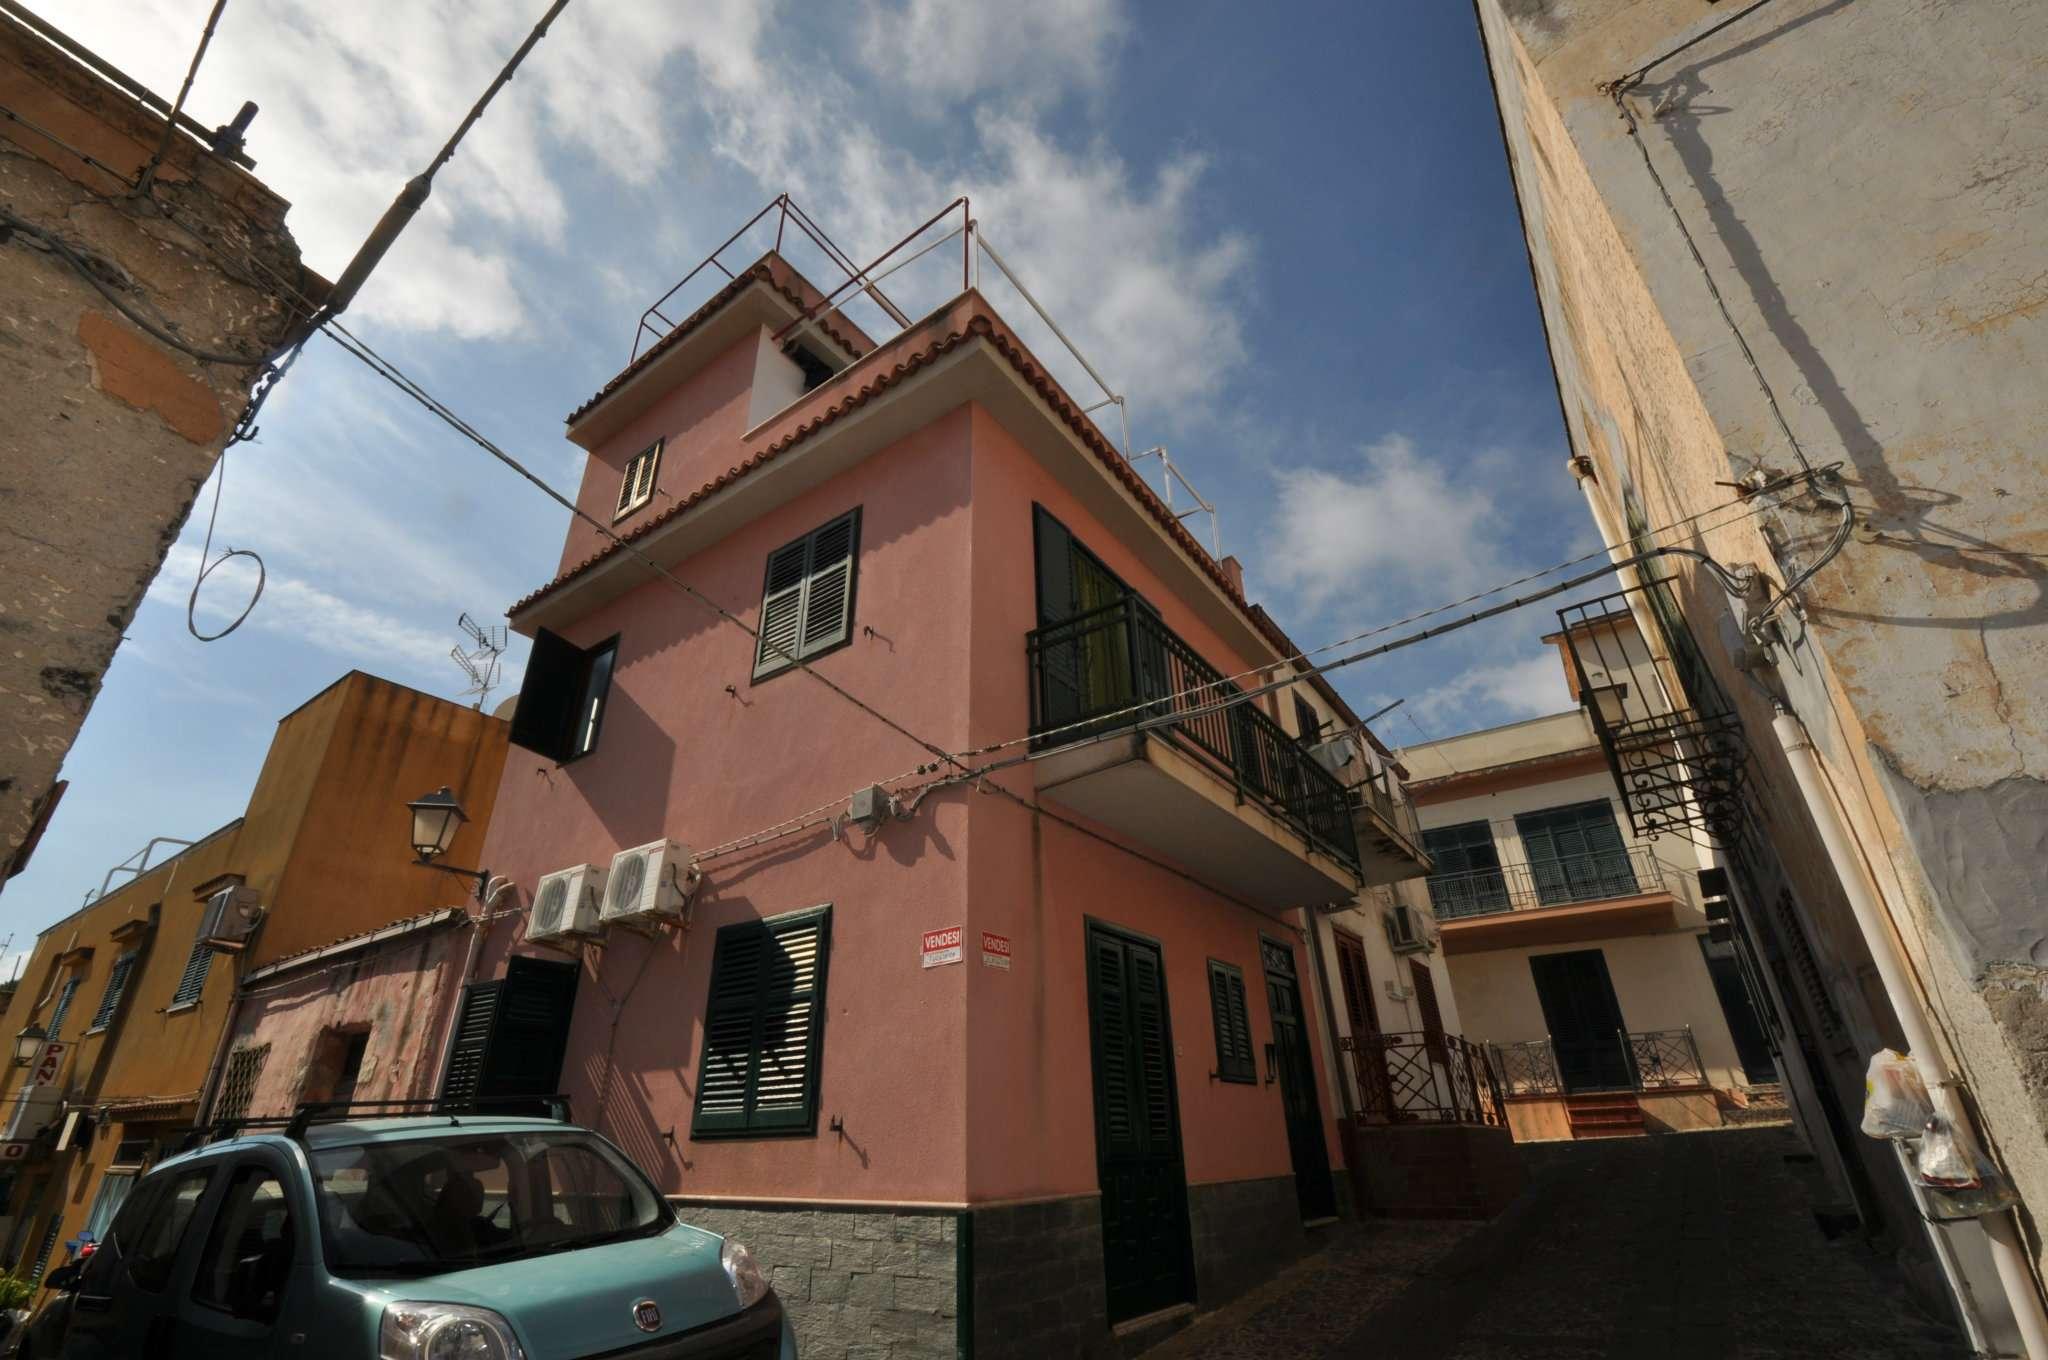 Casa indipendente in Vendita a Ustica: 4 locali, 90 mq